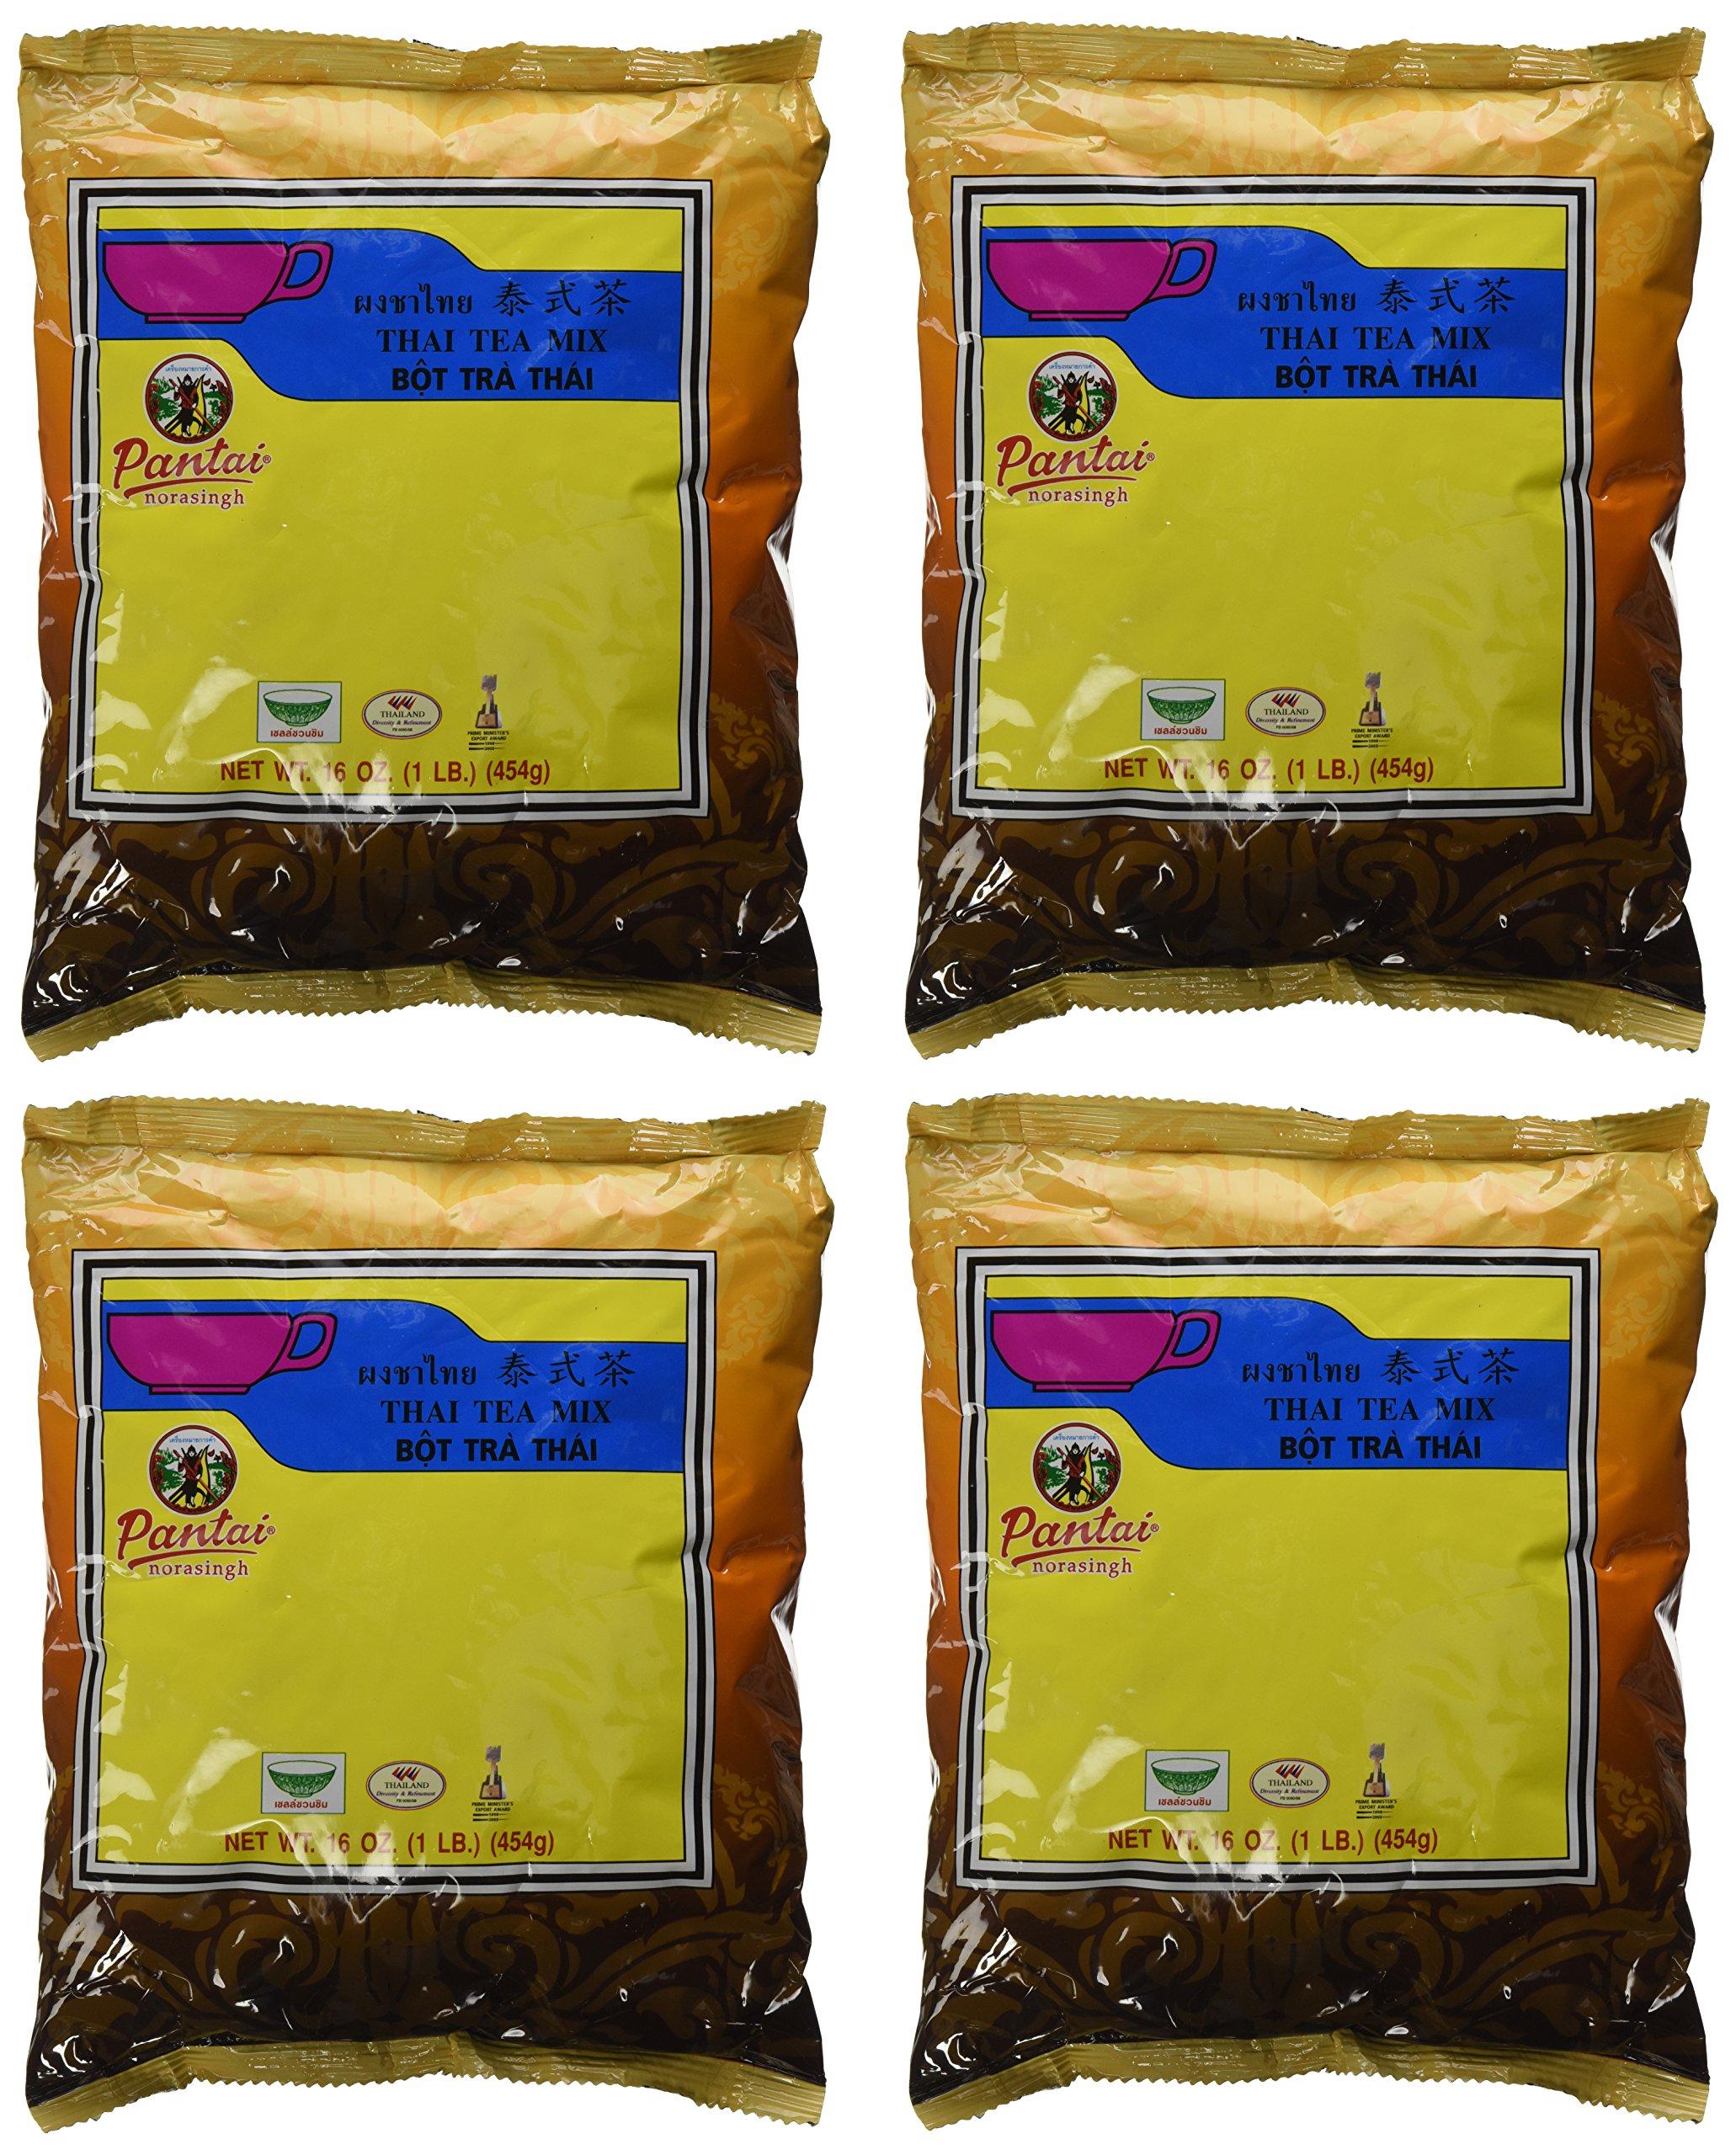 Pantainorasingh Thai Tea Mix, 16-Ounce Bags (Pack of 4)